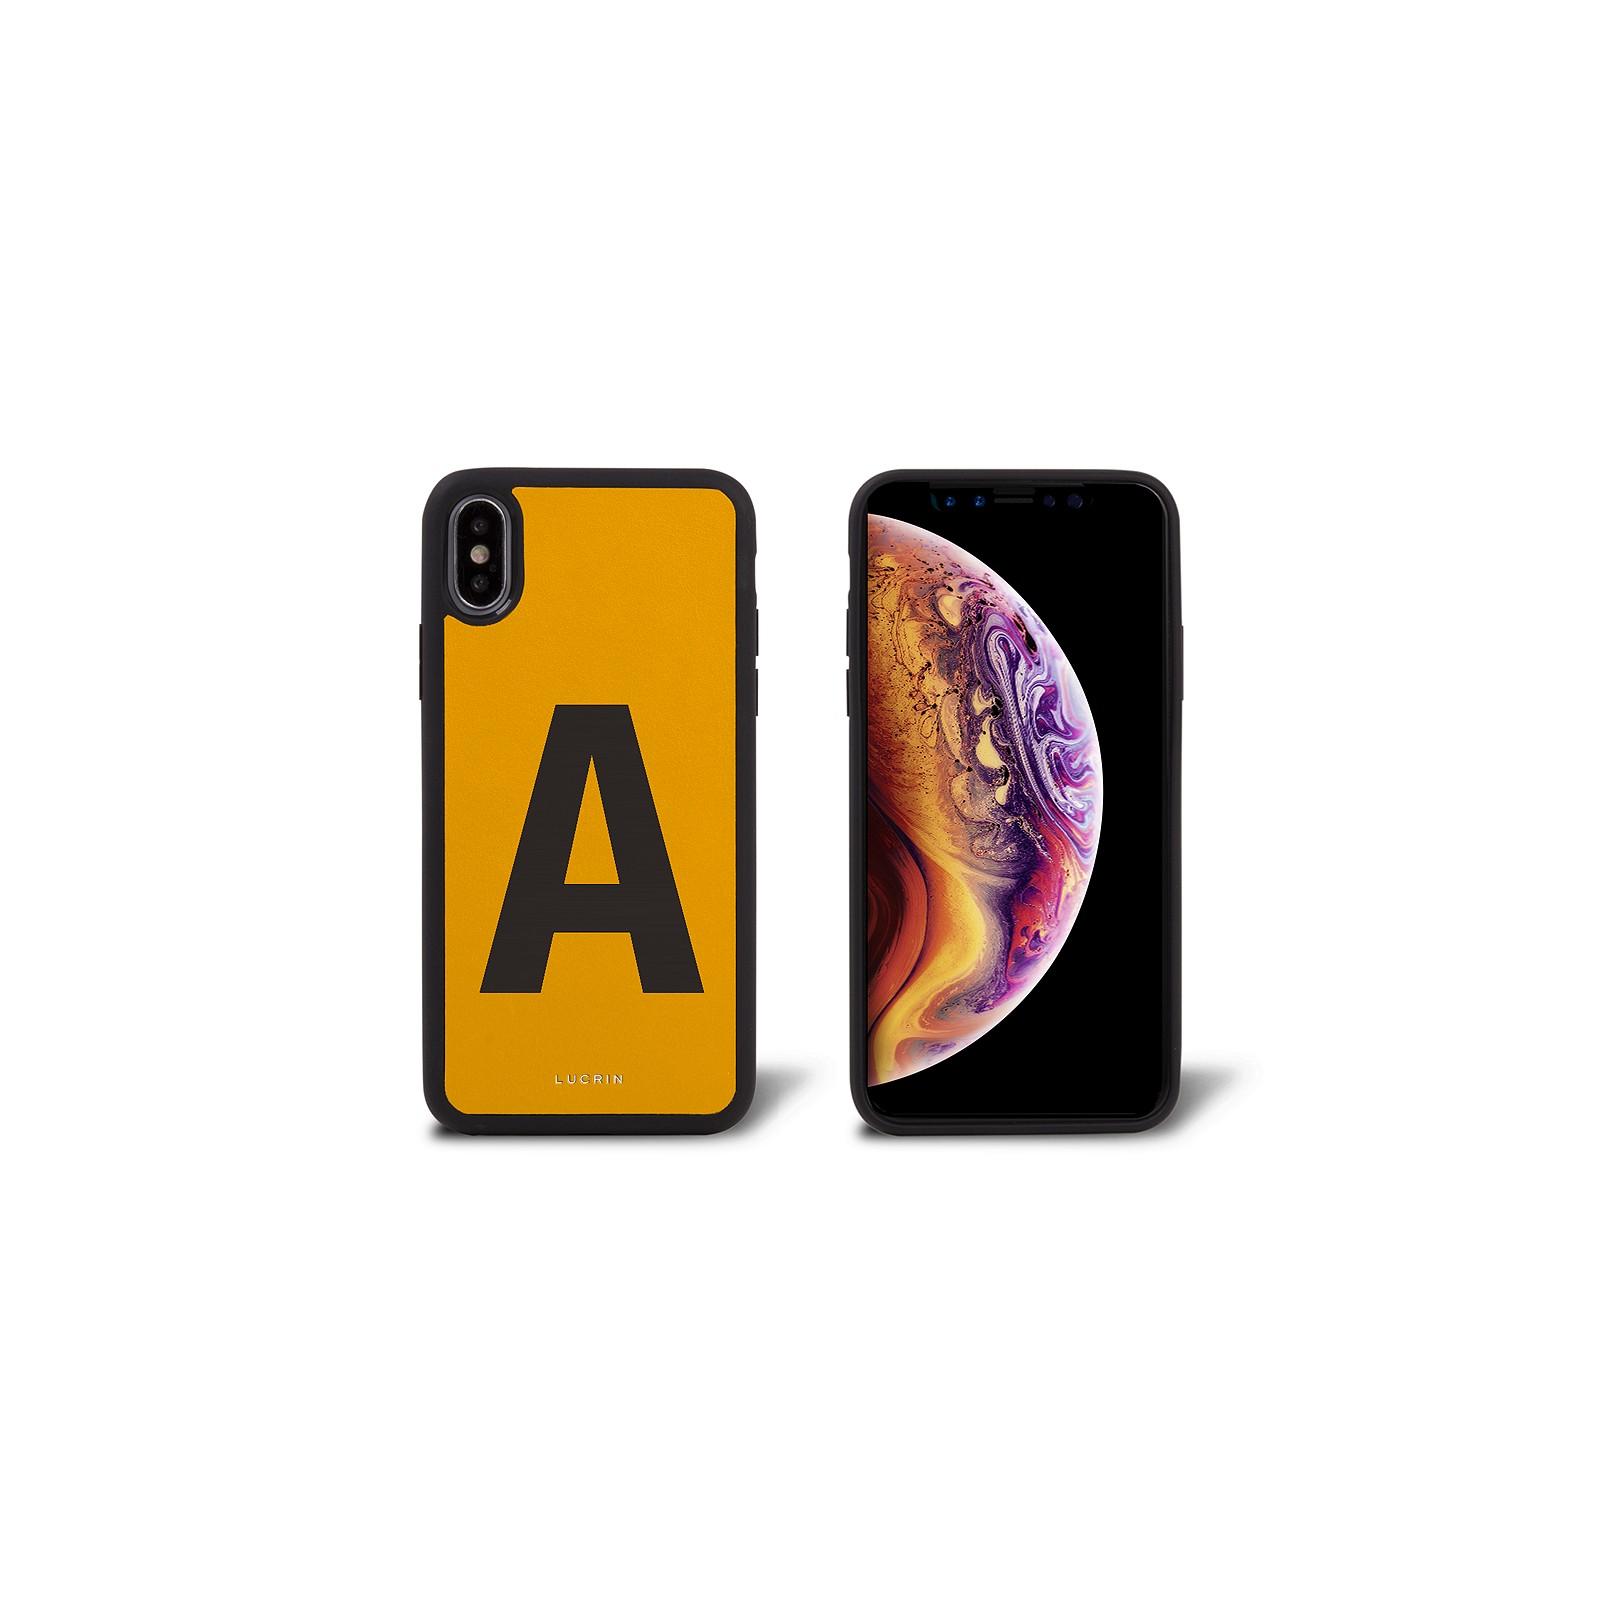 Personalisierte Iphone Xs Max Hülle Aus Leder